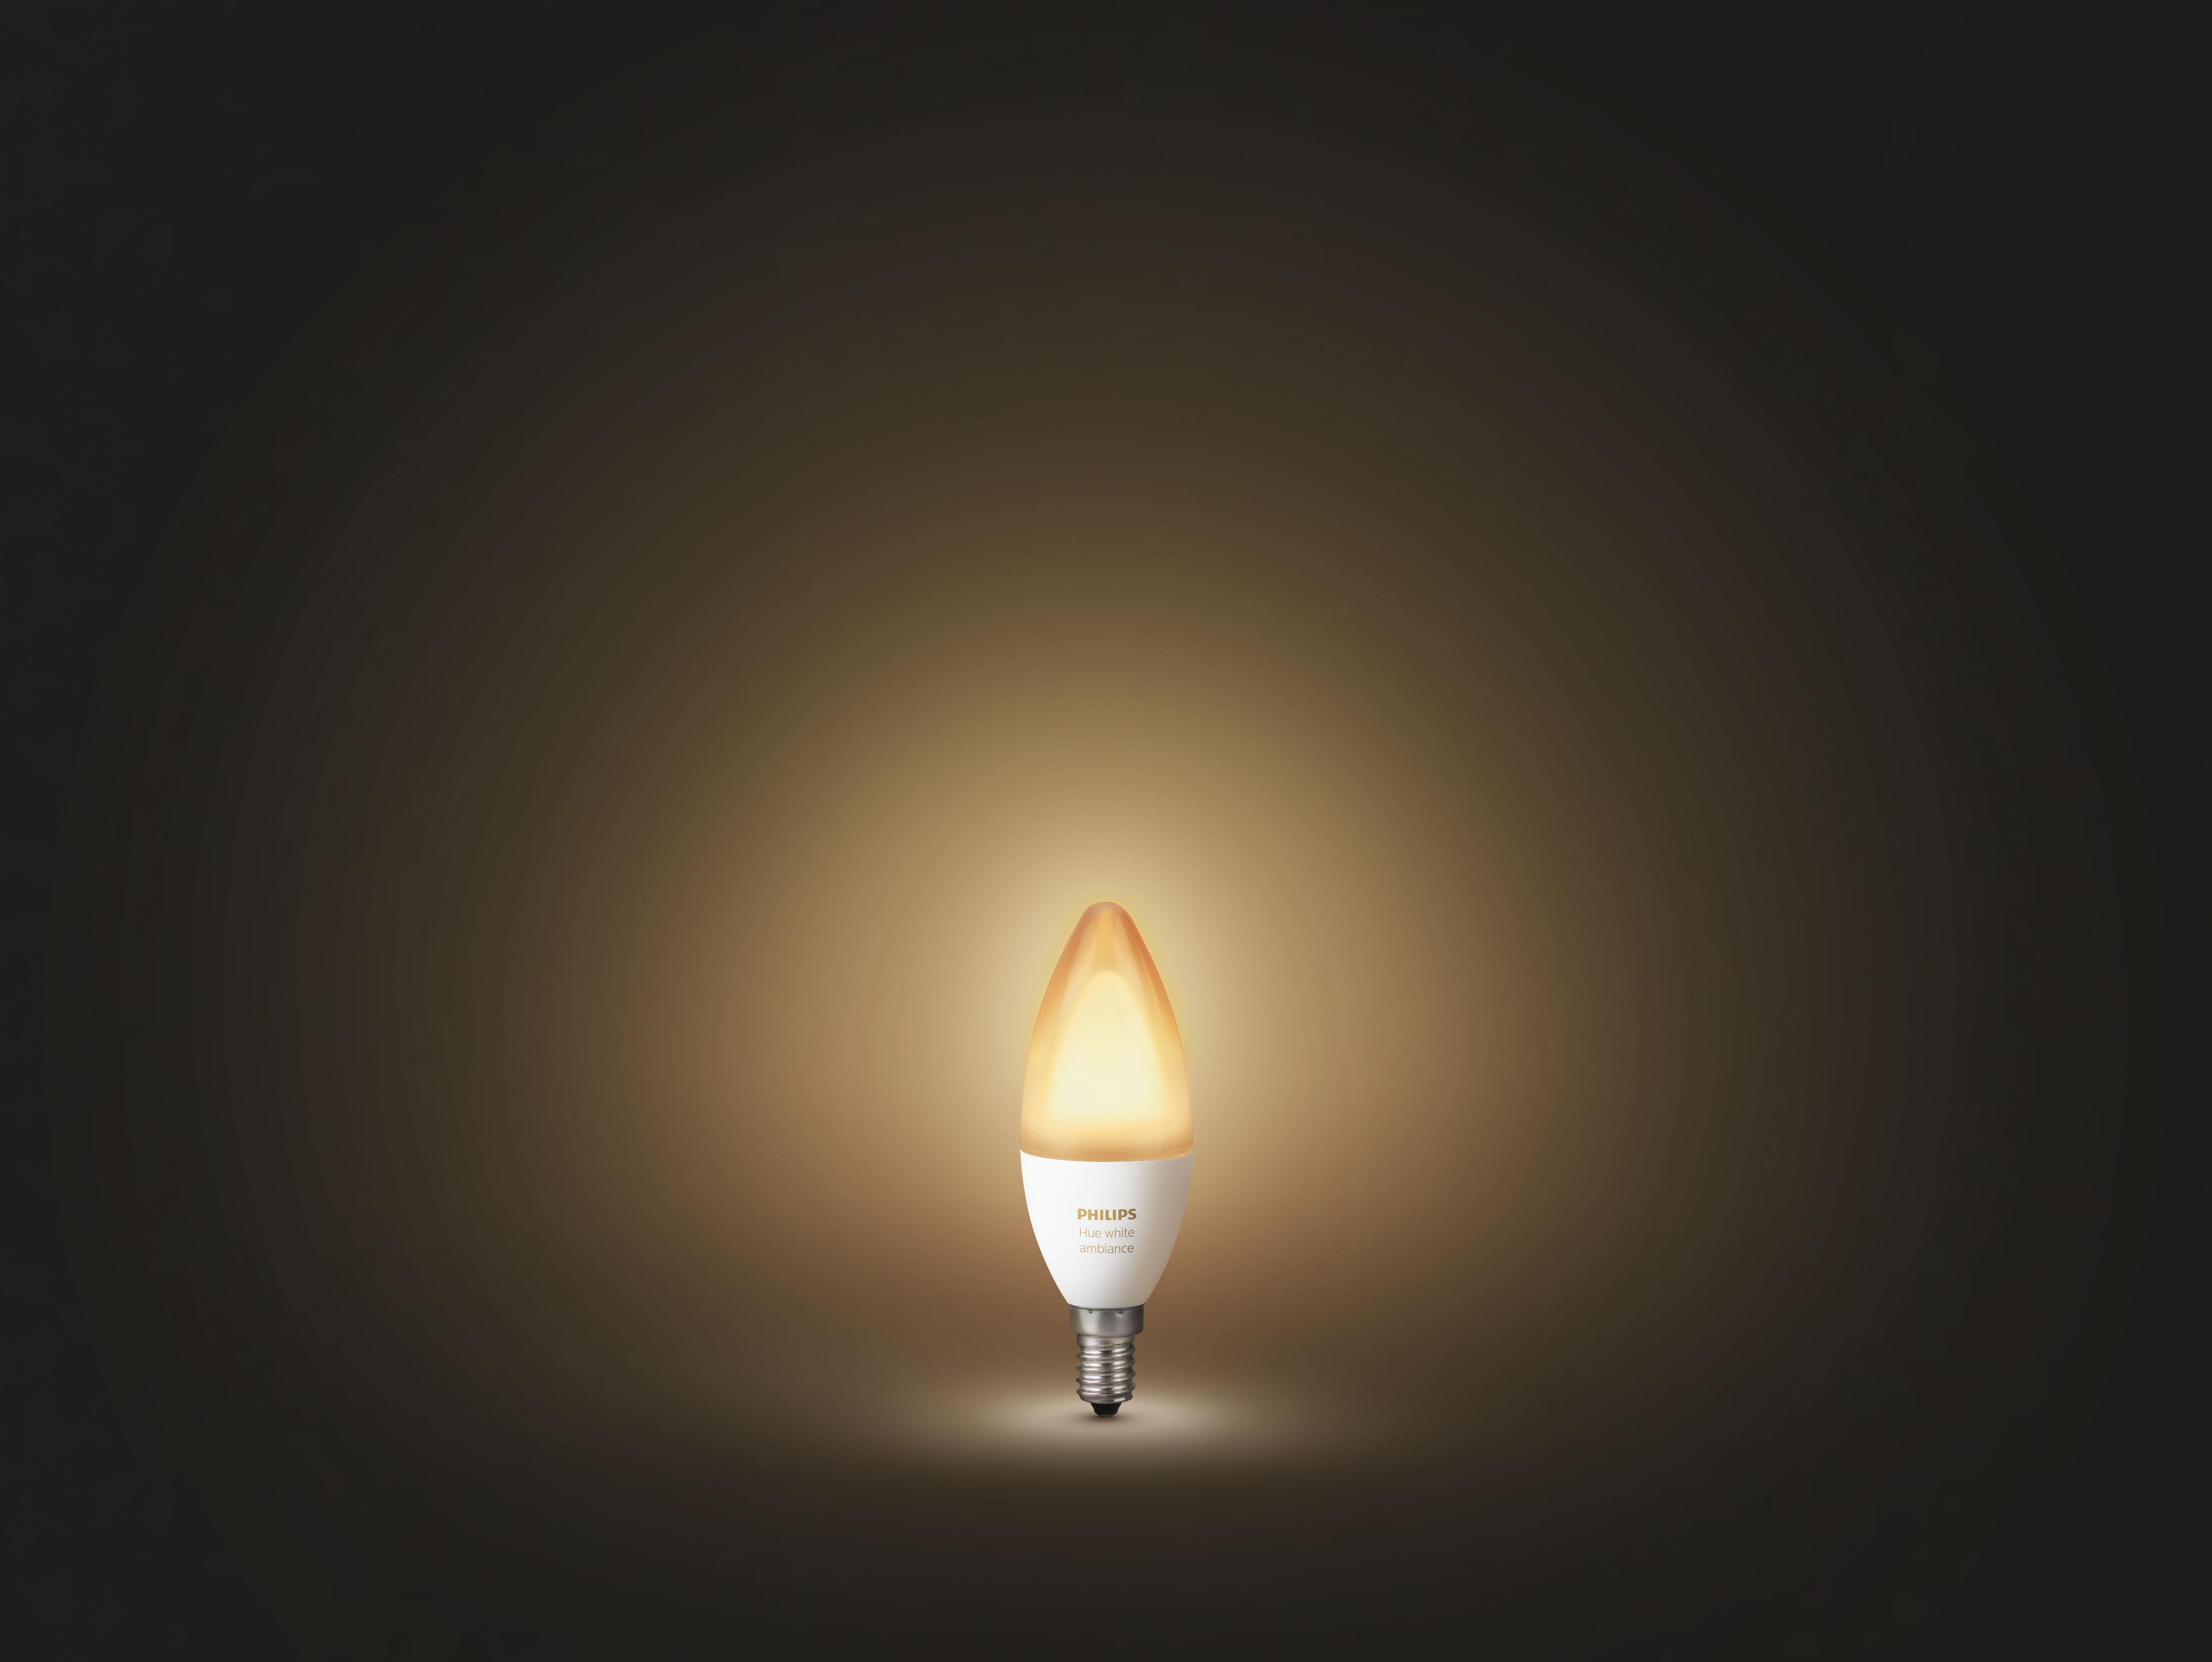 hue-e14-white-ambiance-frei6-li-20170317 Spannende Lampen Per App Steuern Dekorationen